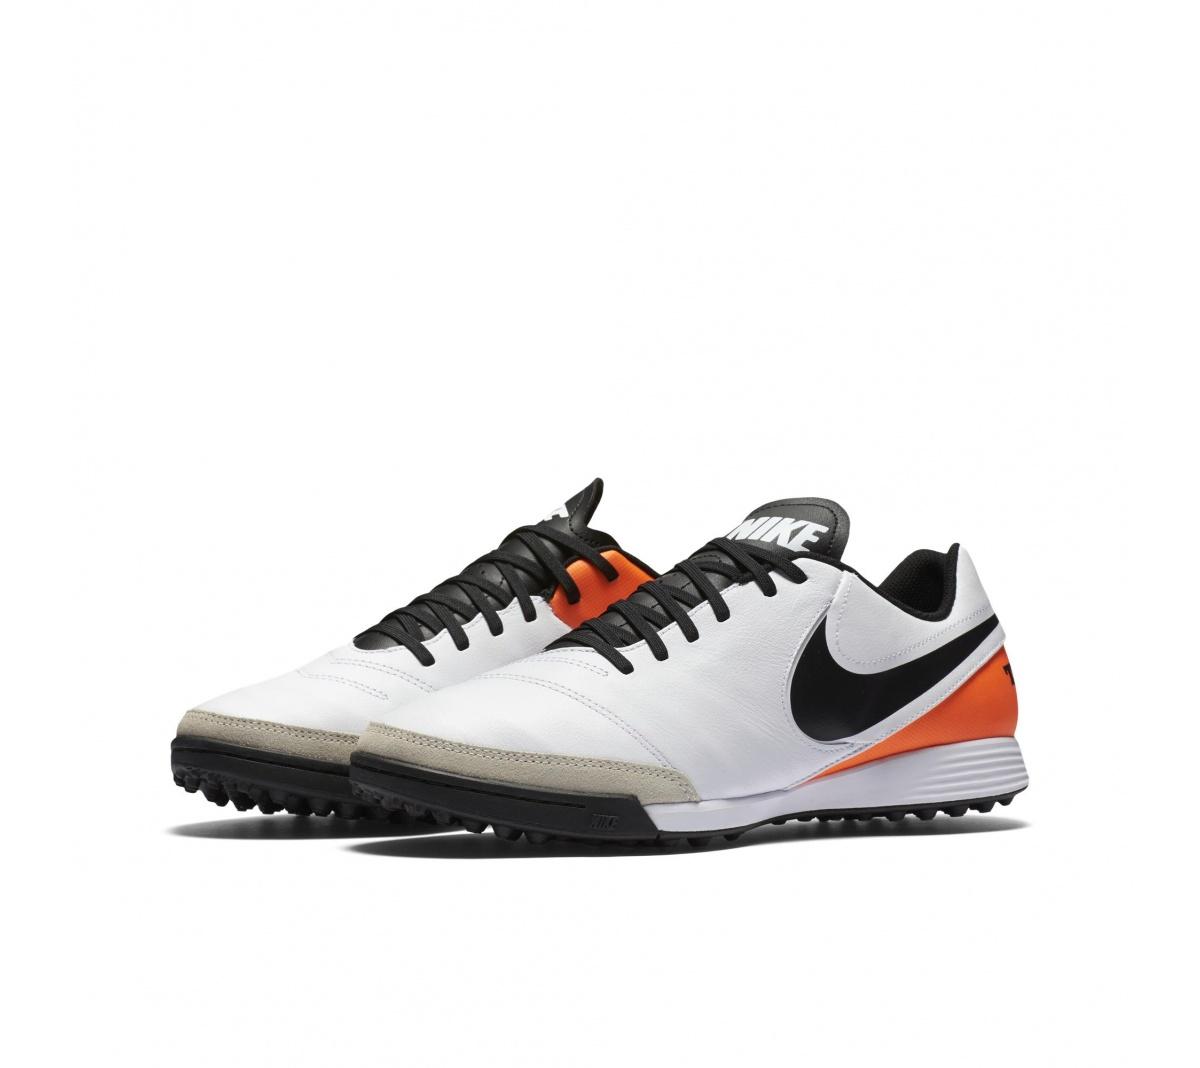 5fbb3e4b6fabc Chuteira Nike Tiempo Gênio II Society - Mundo do Futebol